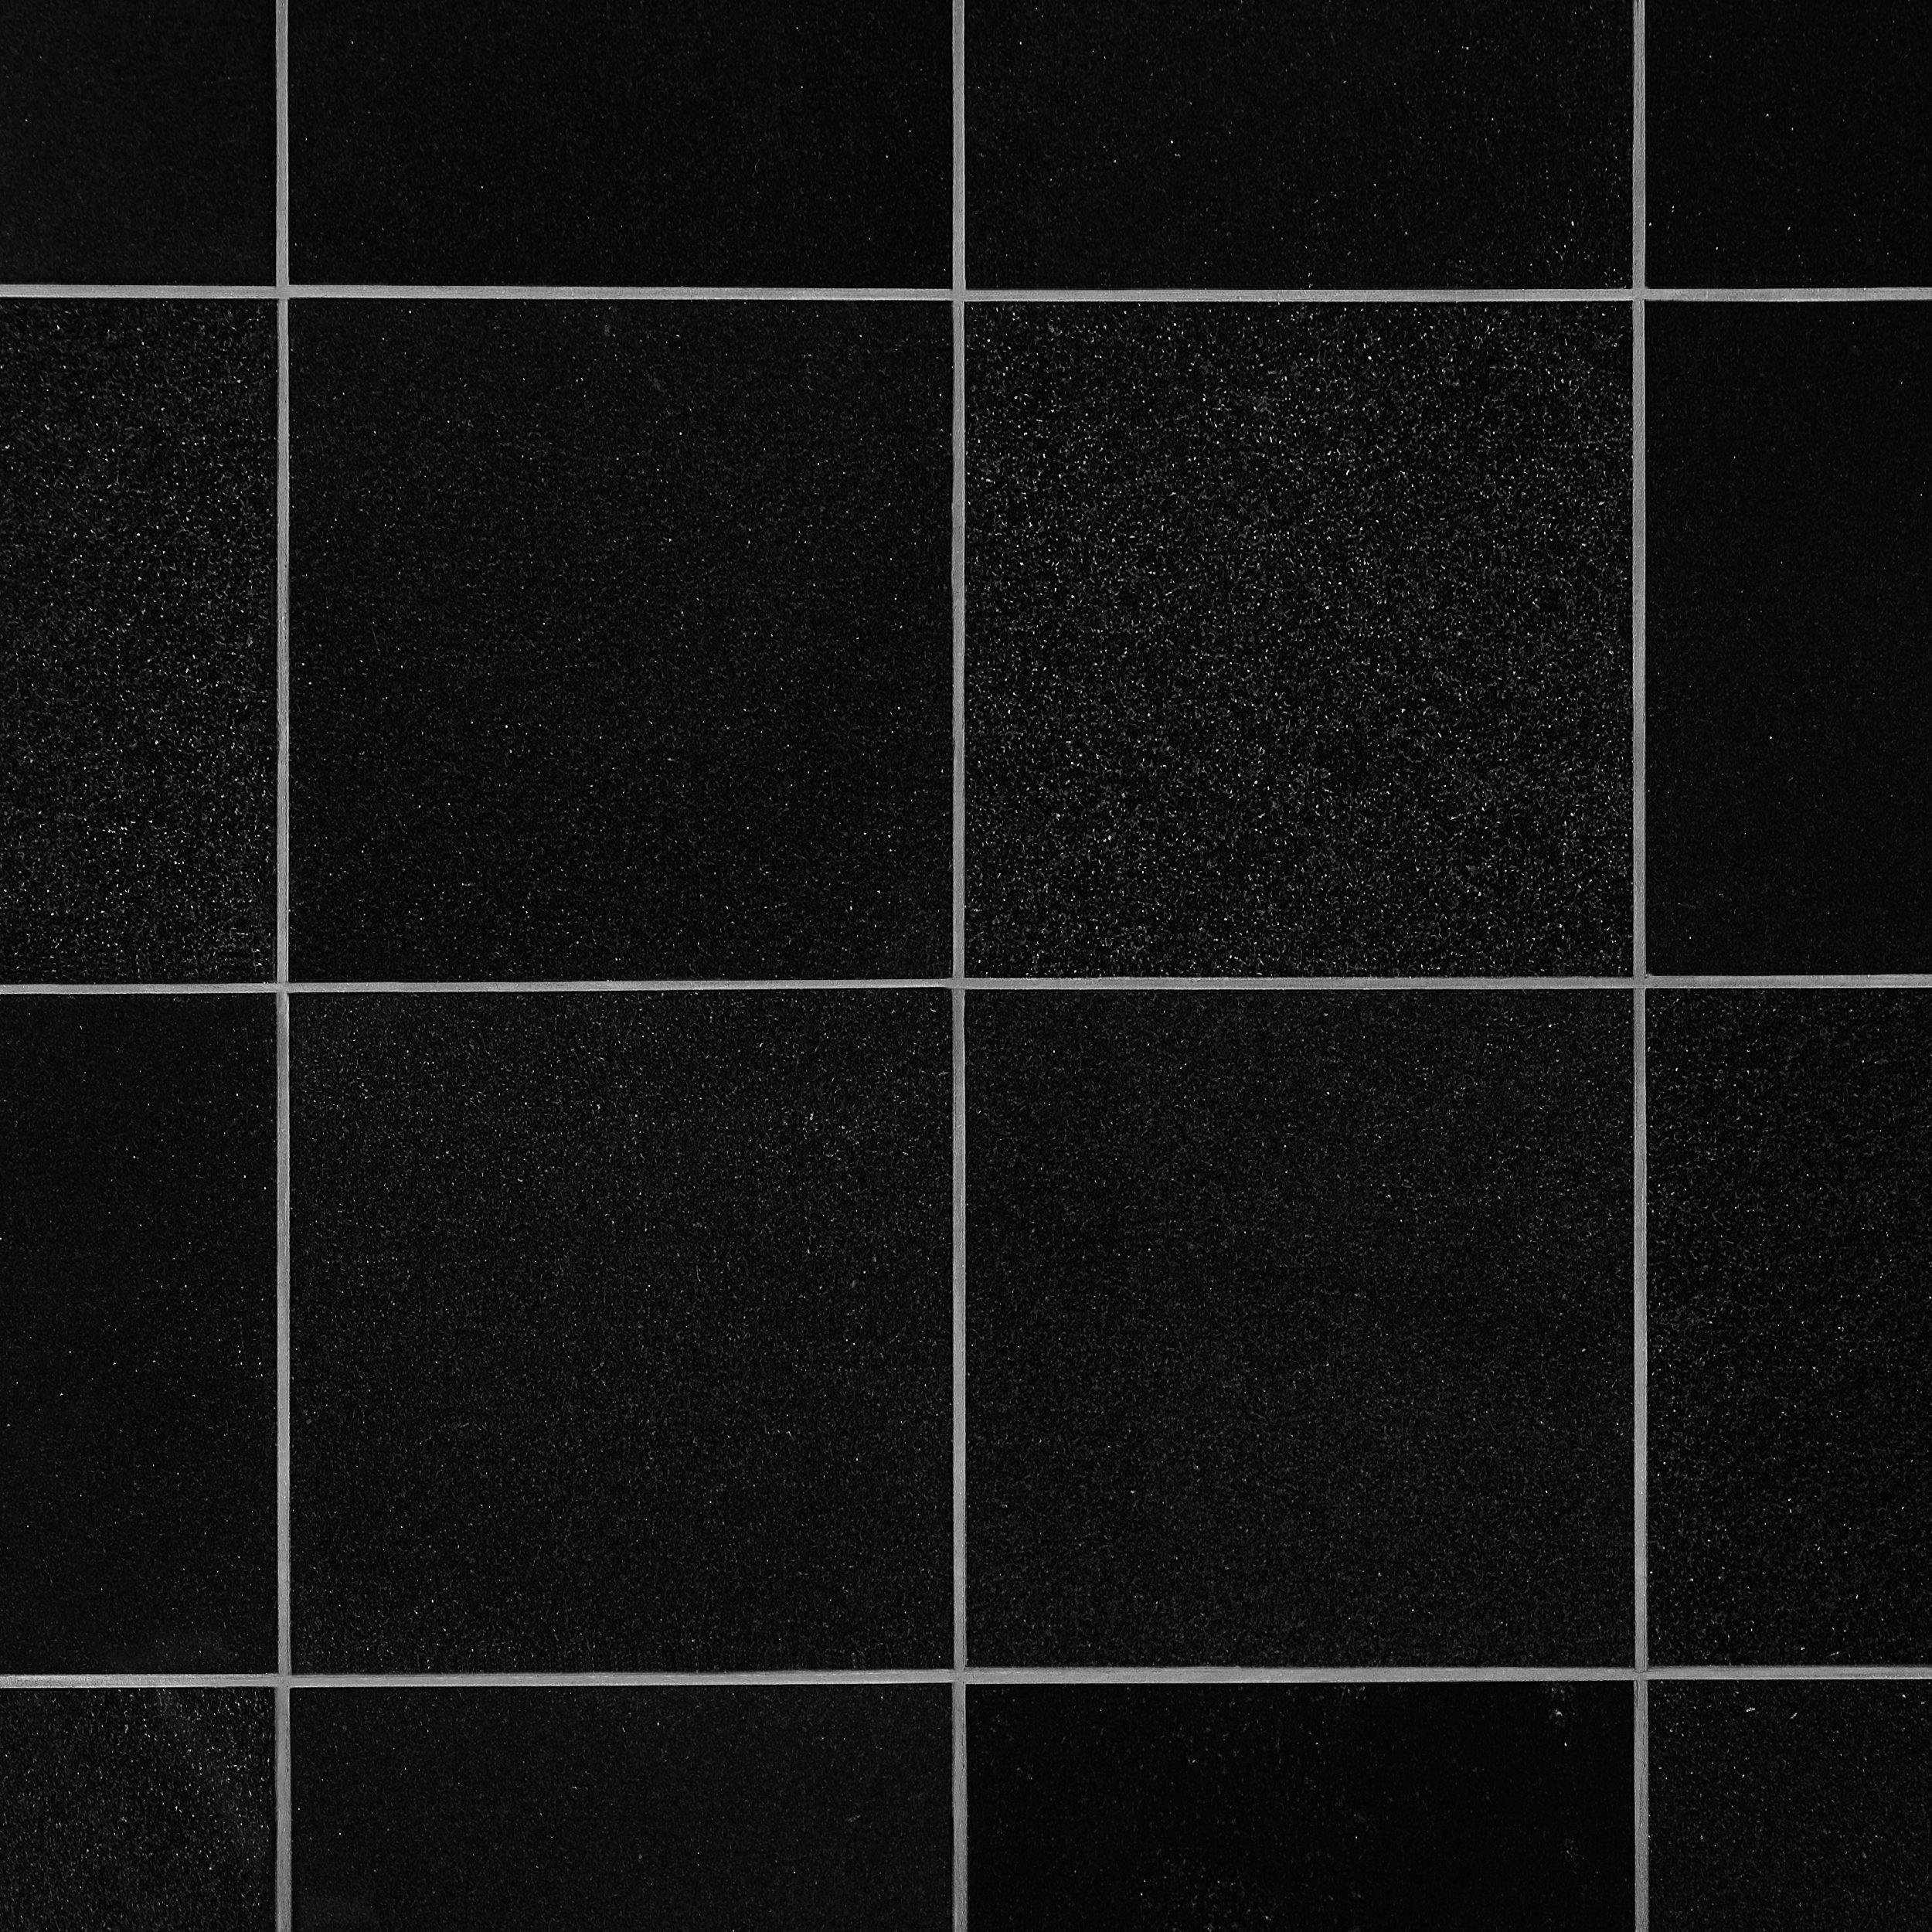 Absolute Black Granite Tile 12 X 12 923100004 Floor And Decor